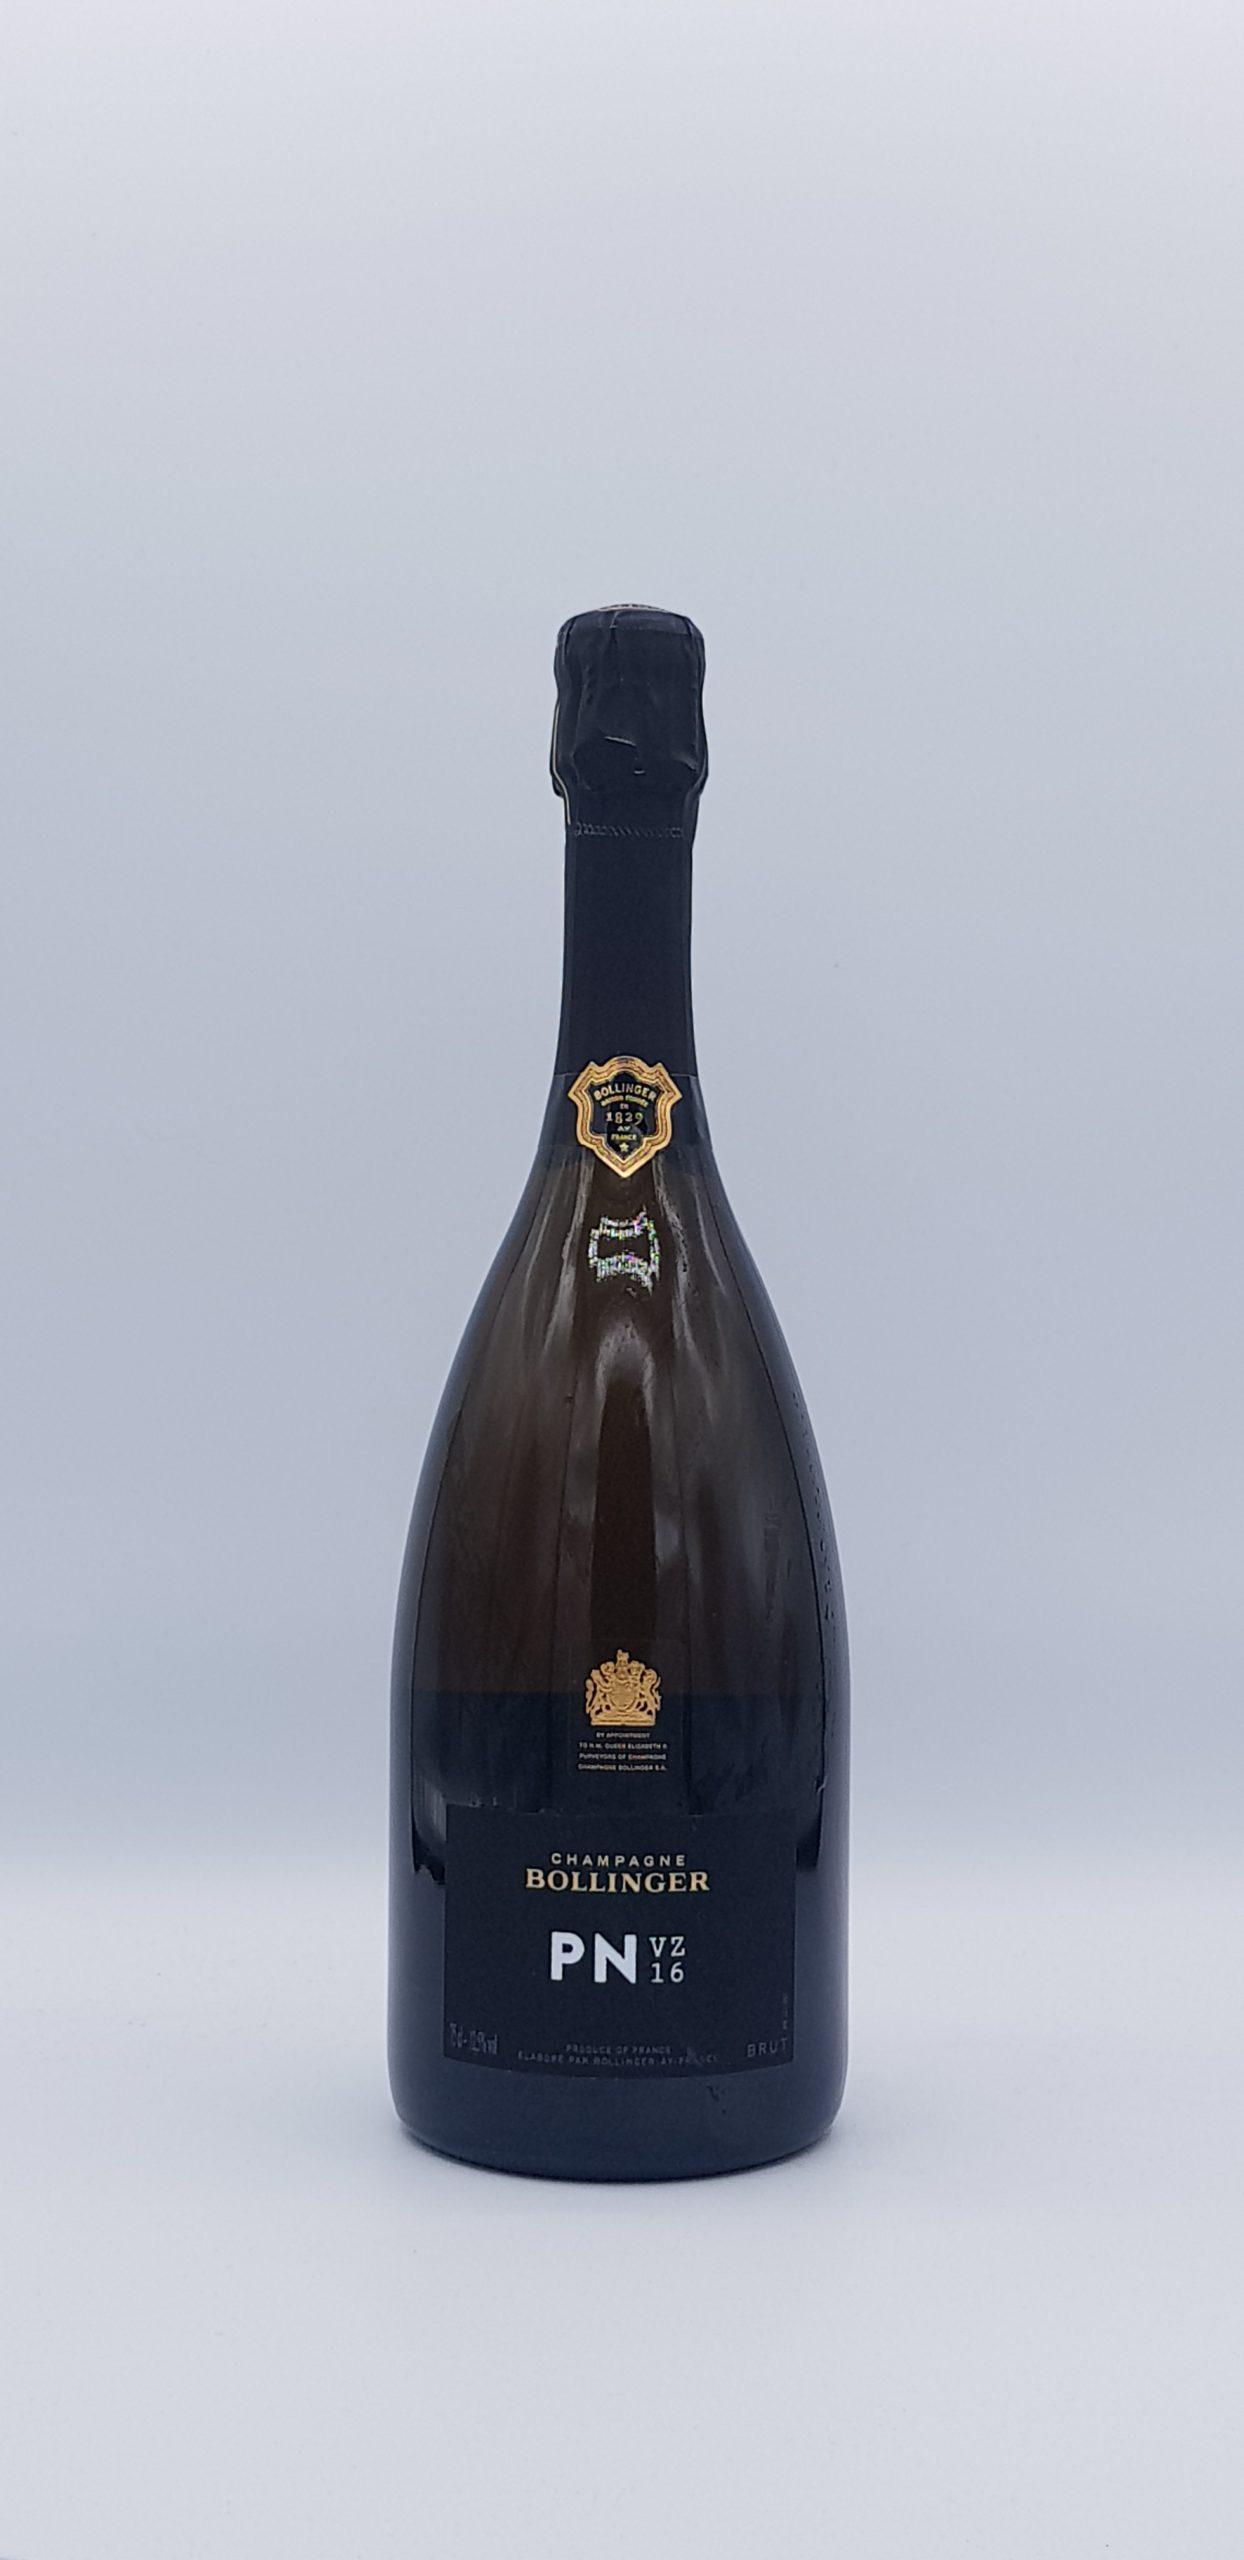 Champagne Bollinger PN VZ16